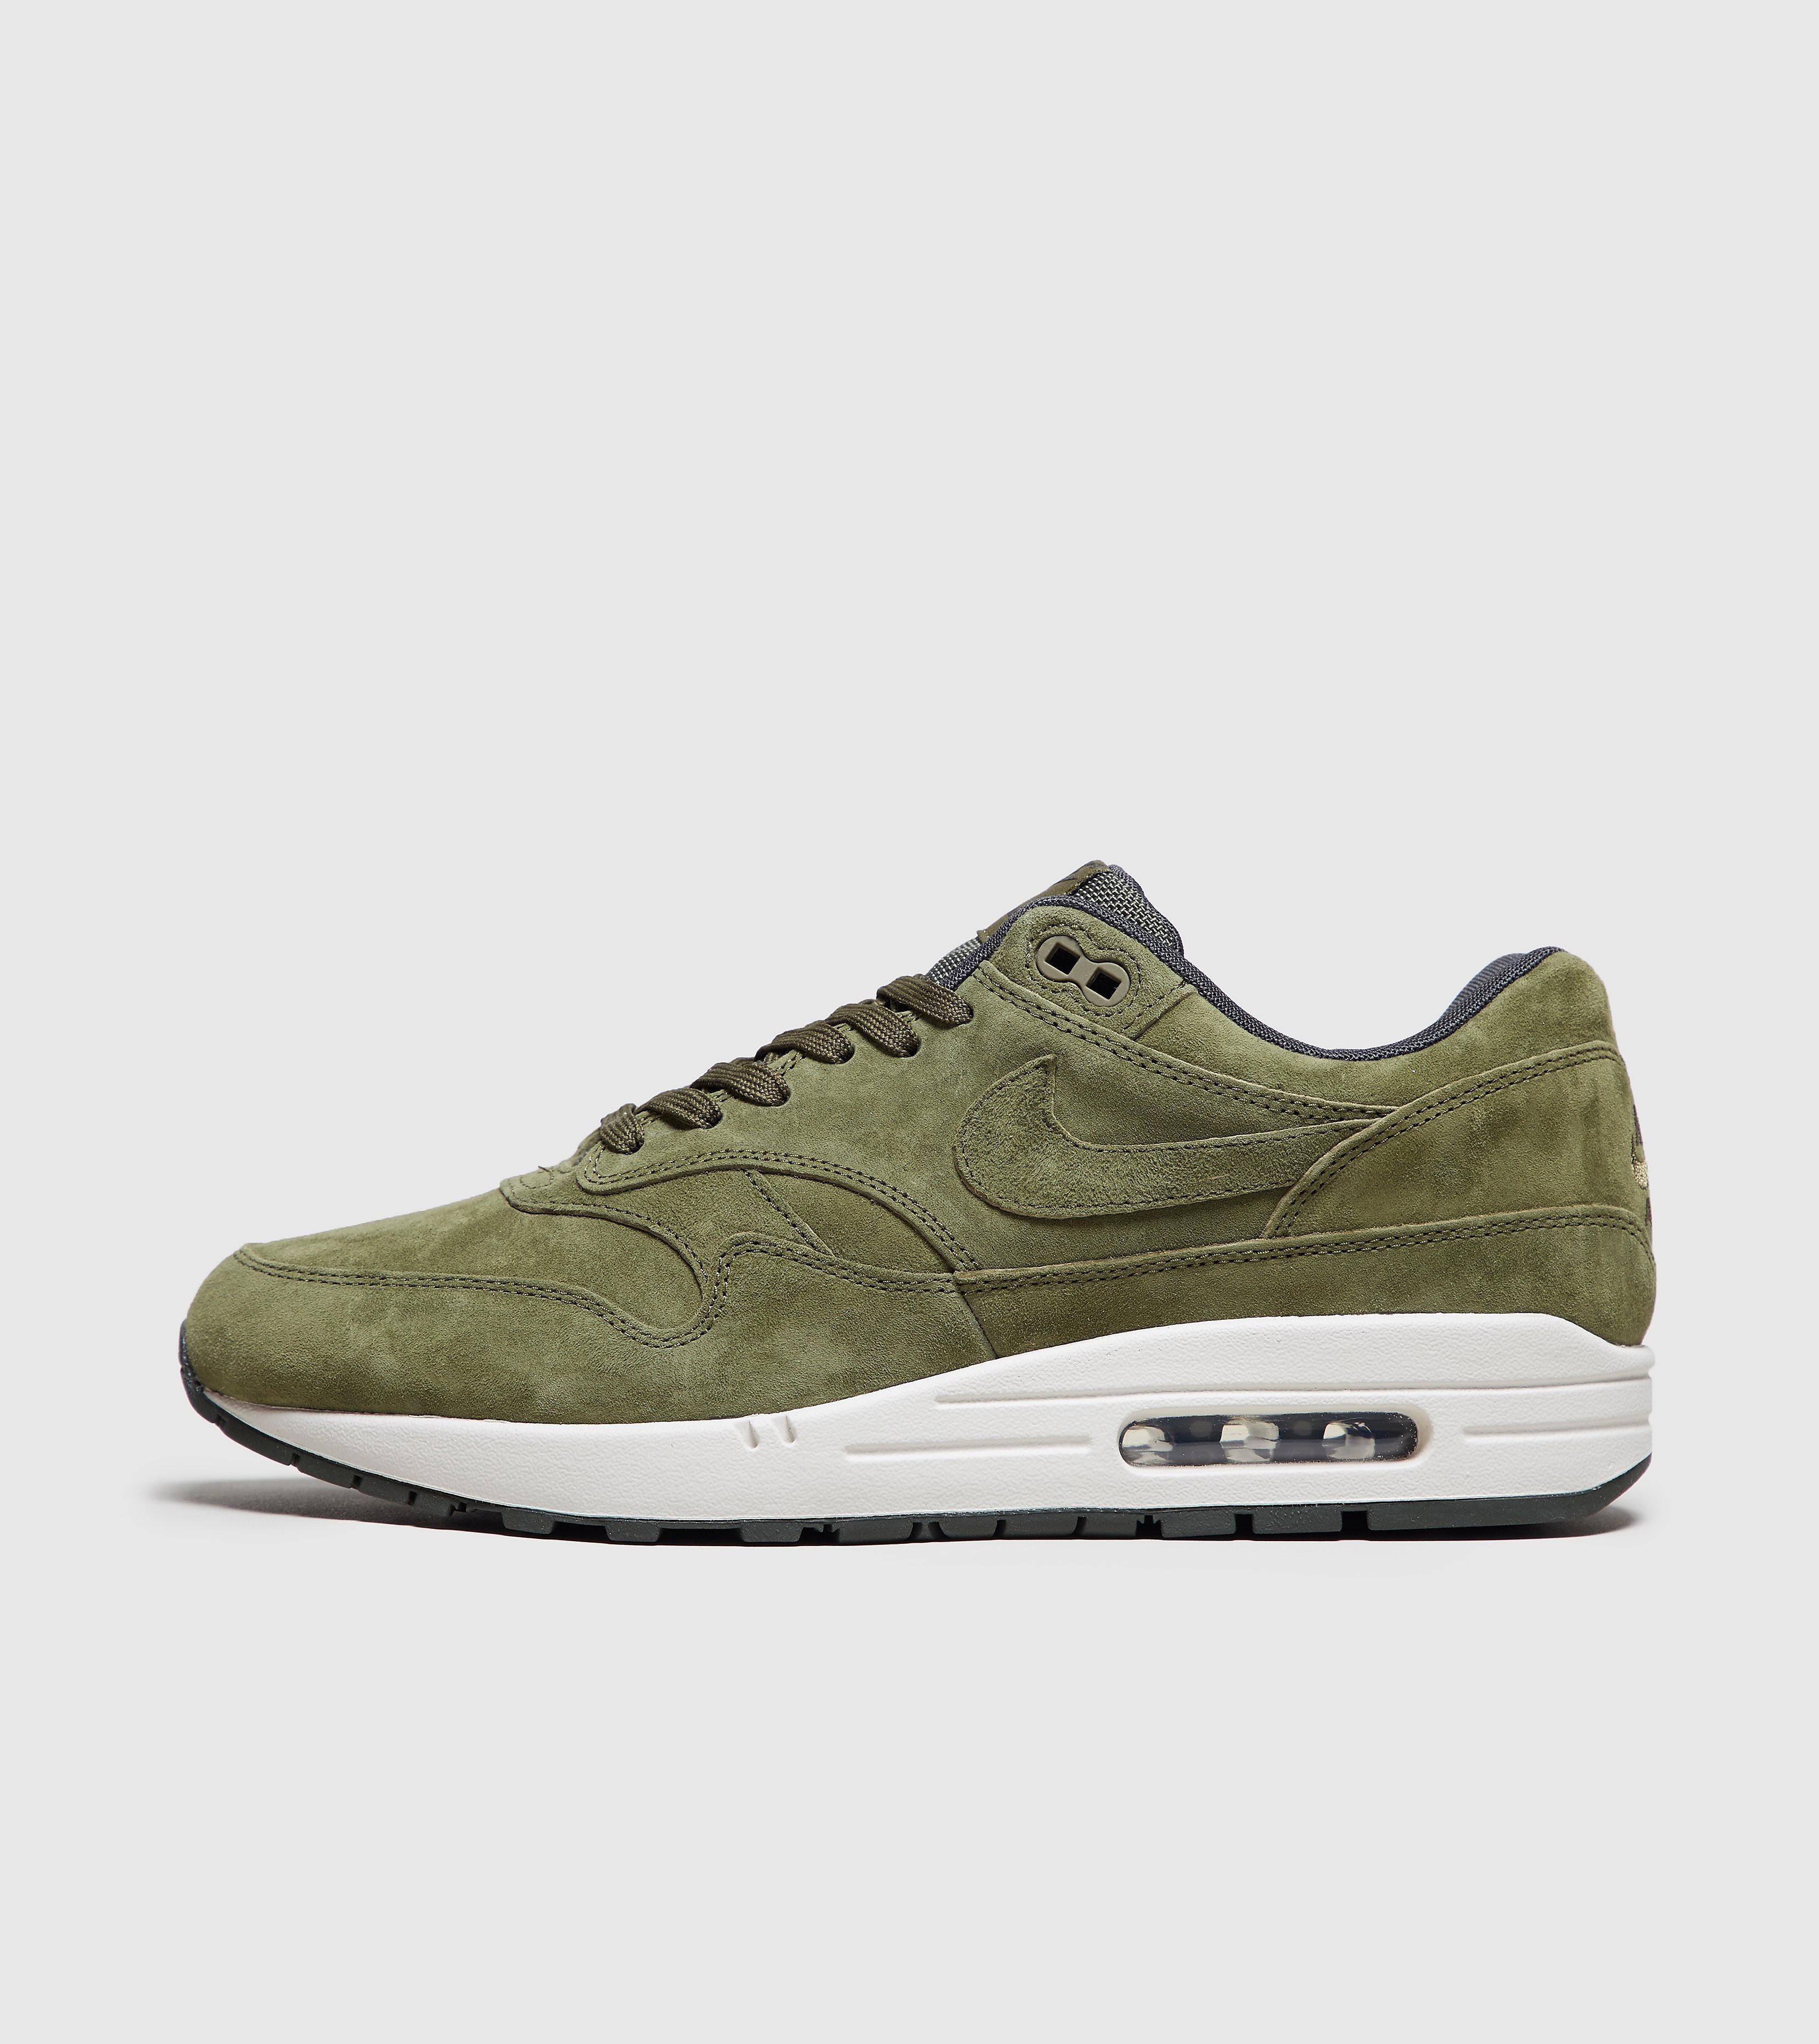 4a1dec2eea5 Aanbieding: Nike Air Max 1 Premium 875844 300 Groen Blauw 405   Nike ...